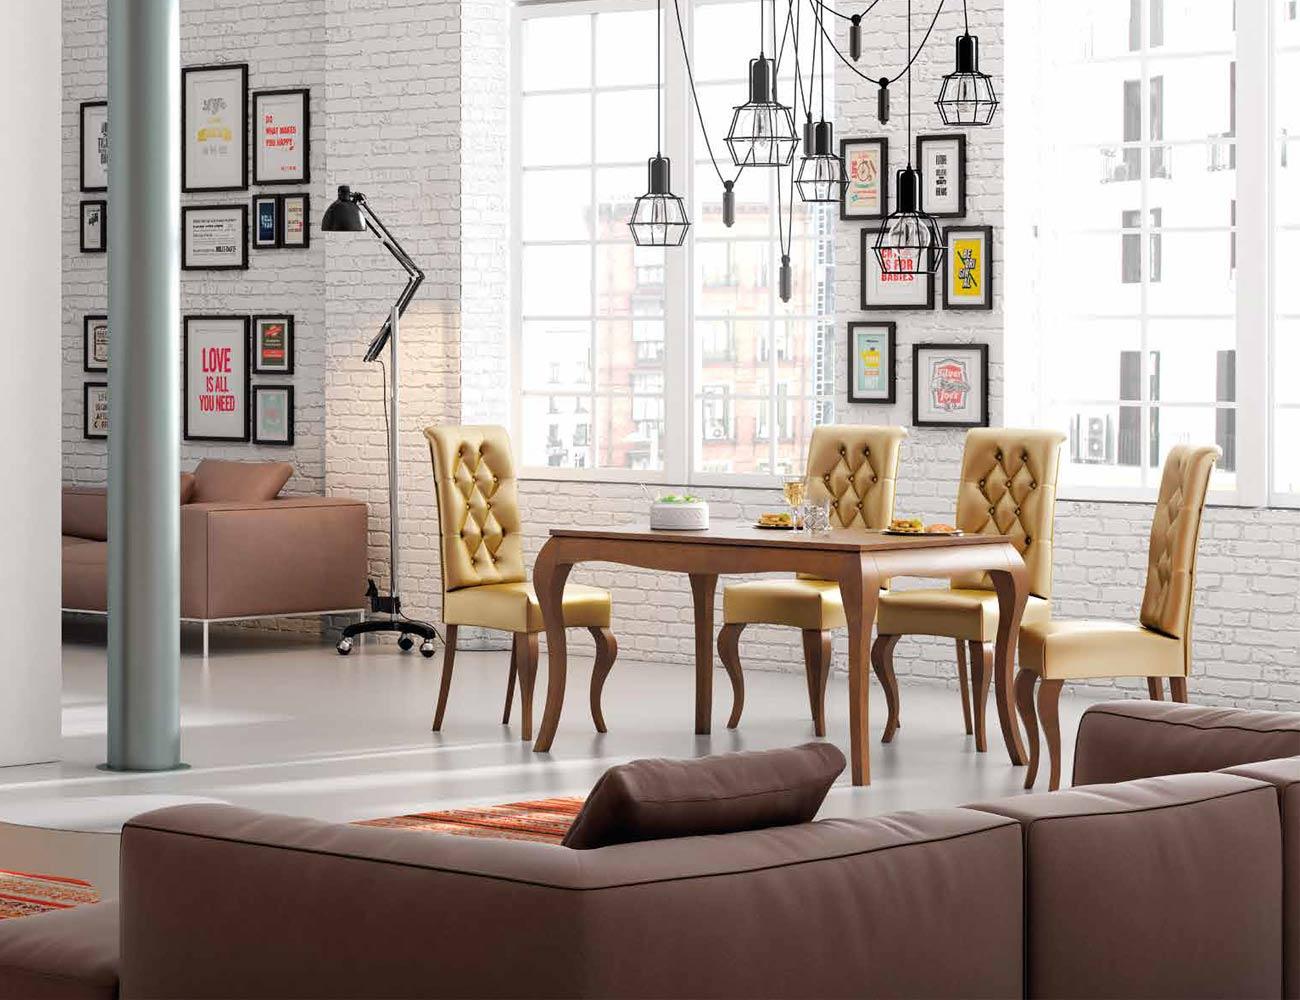 Mesa sillas composicion 02